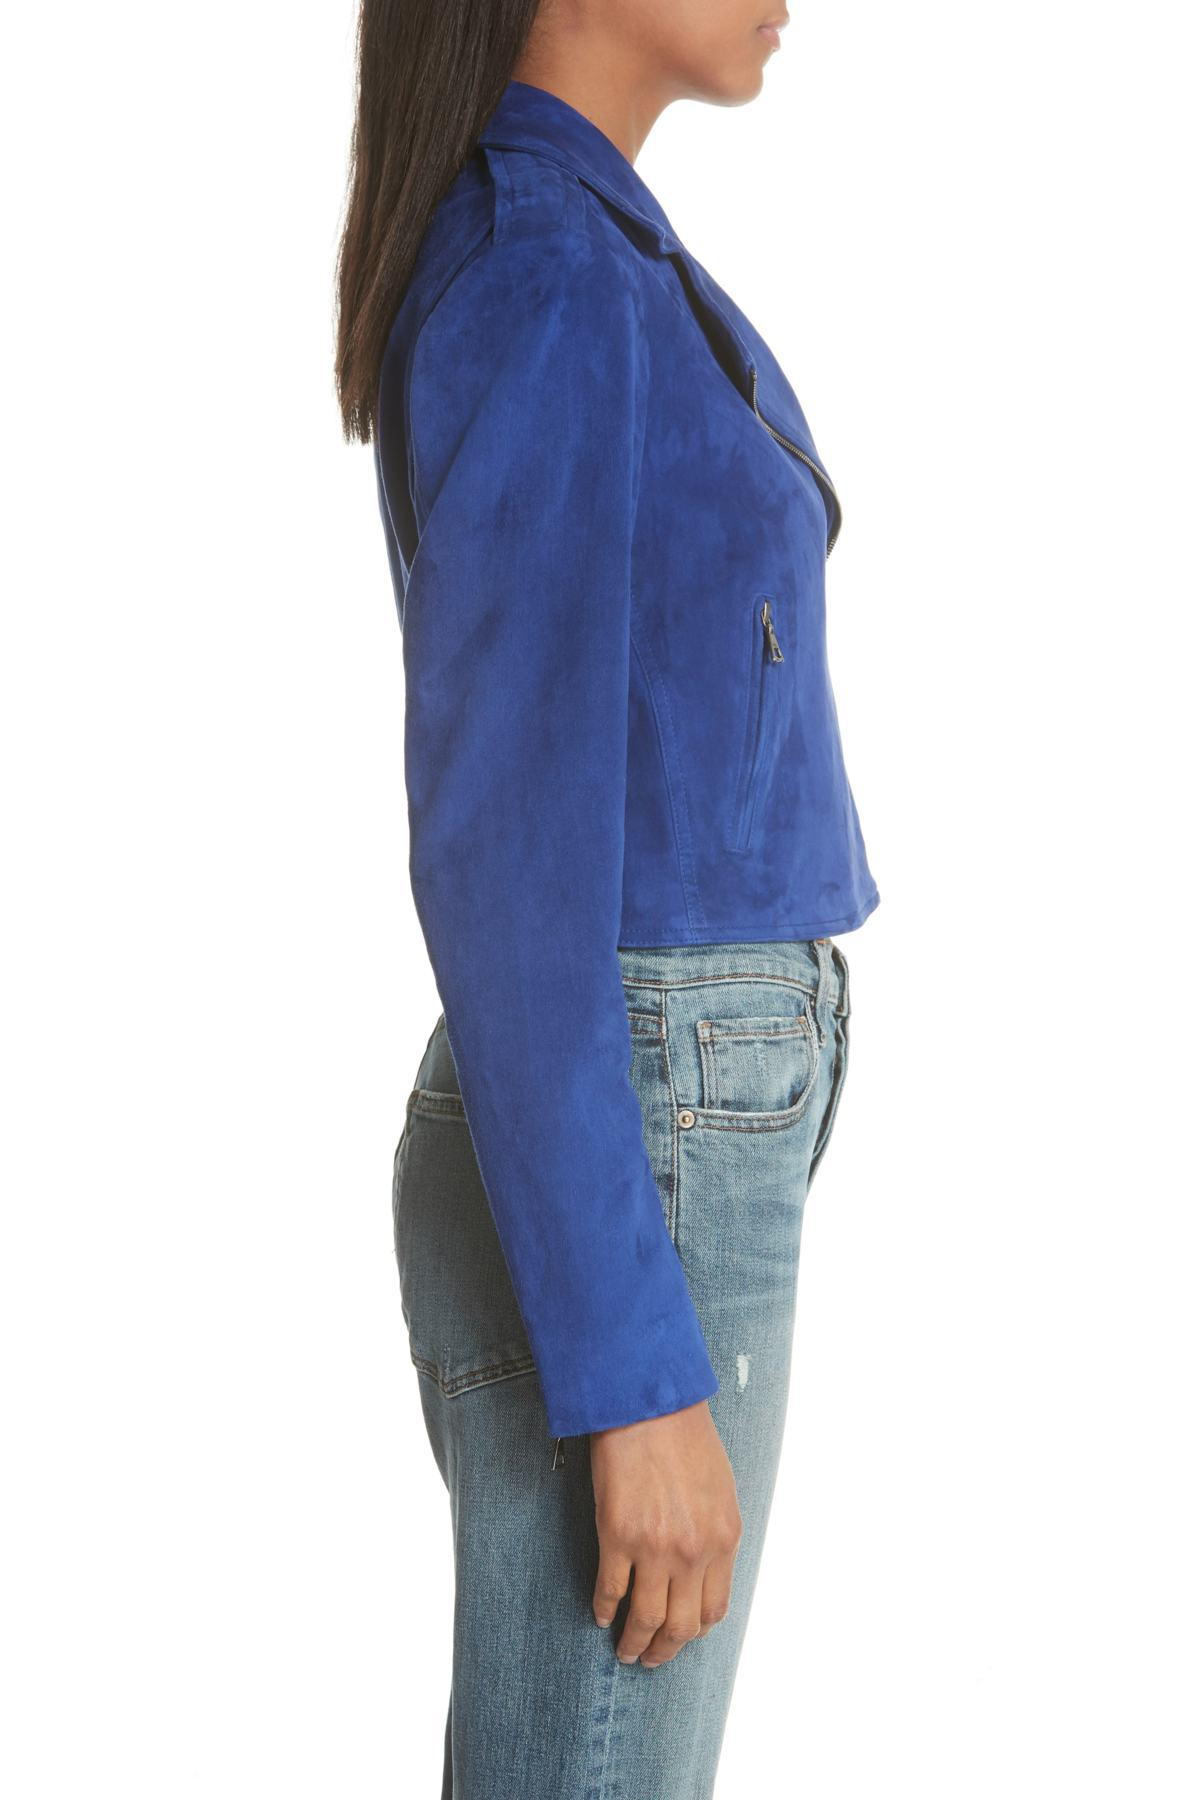 c5d17f3d59 Theory Sanda L Lamb Suede Moto Jacket in Blue - Lyst